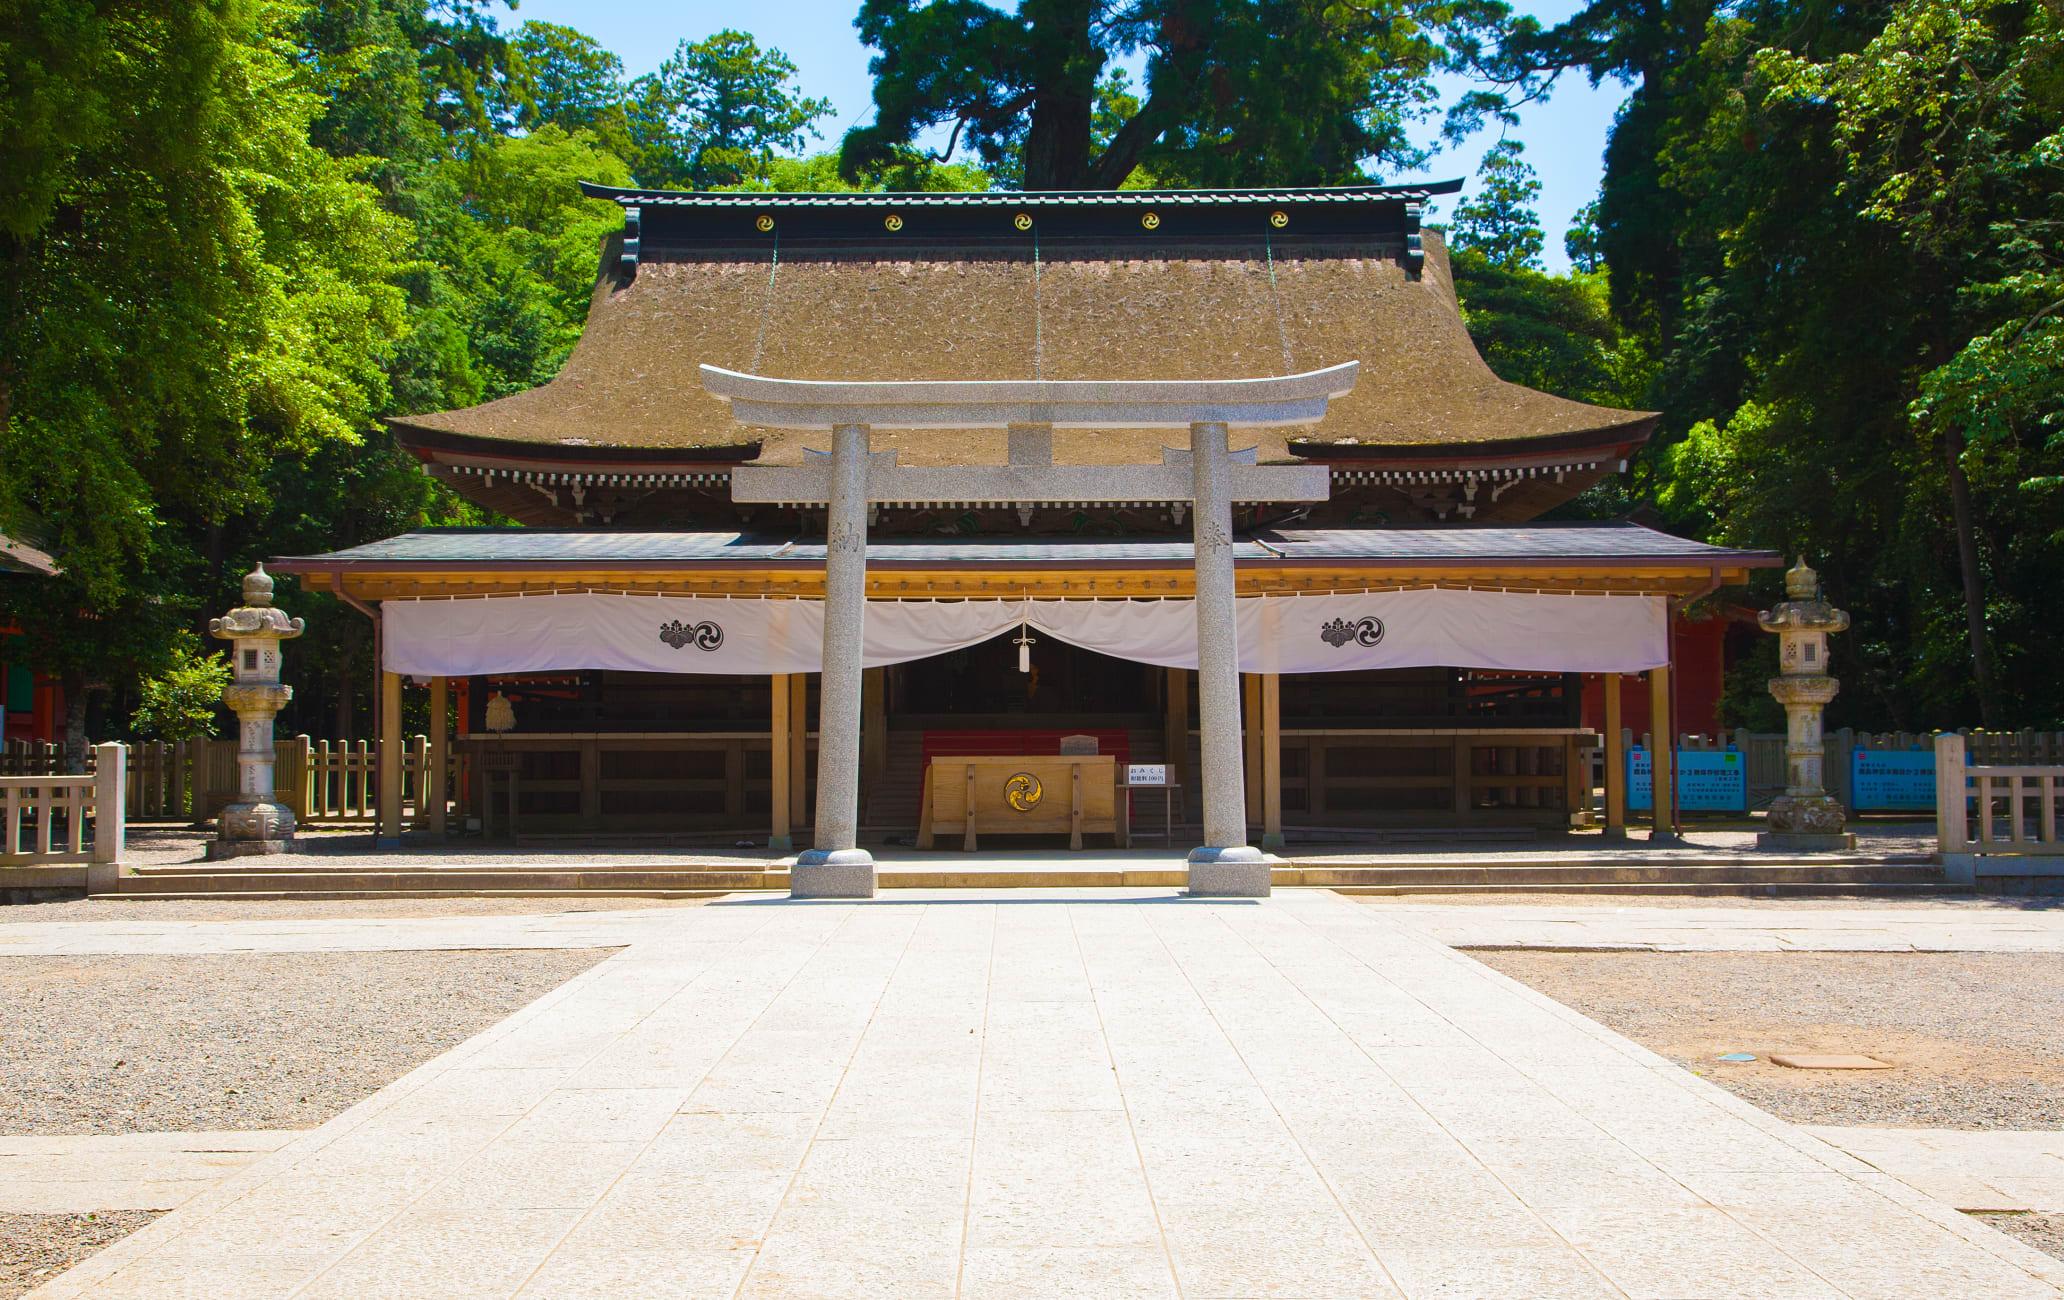 Kashima-jingu Shrine